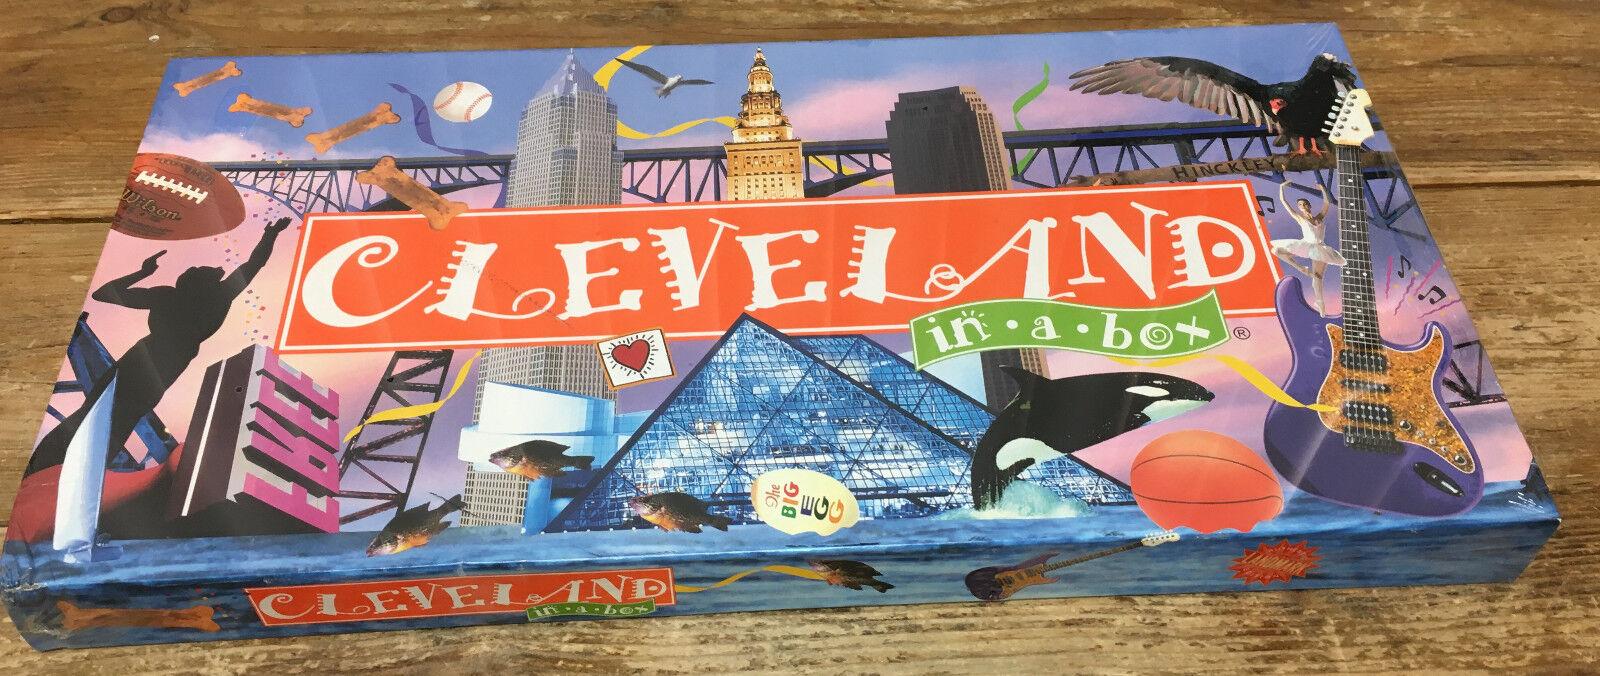 Cleveland Opoly Clevelandopoly Board Game NIP New Landmark City Box 730799001109